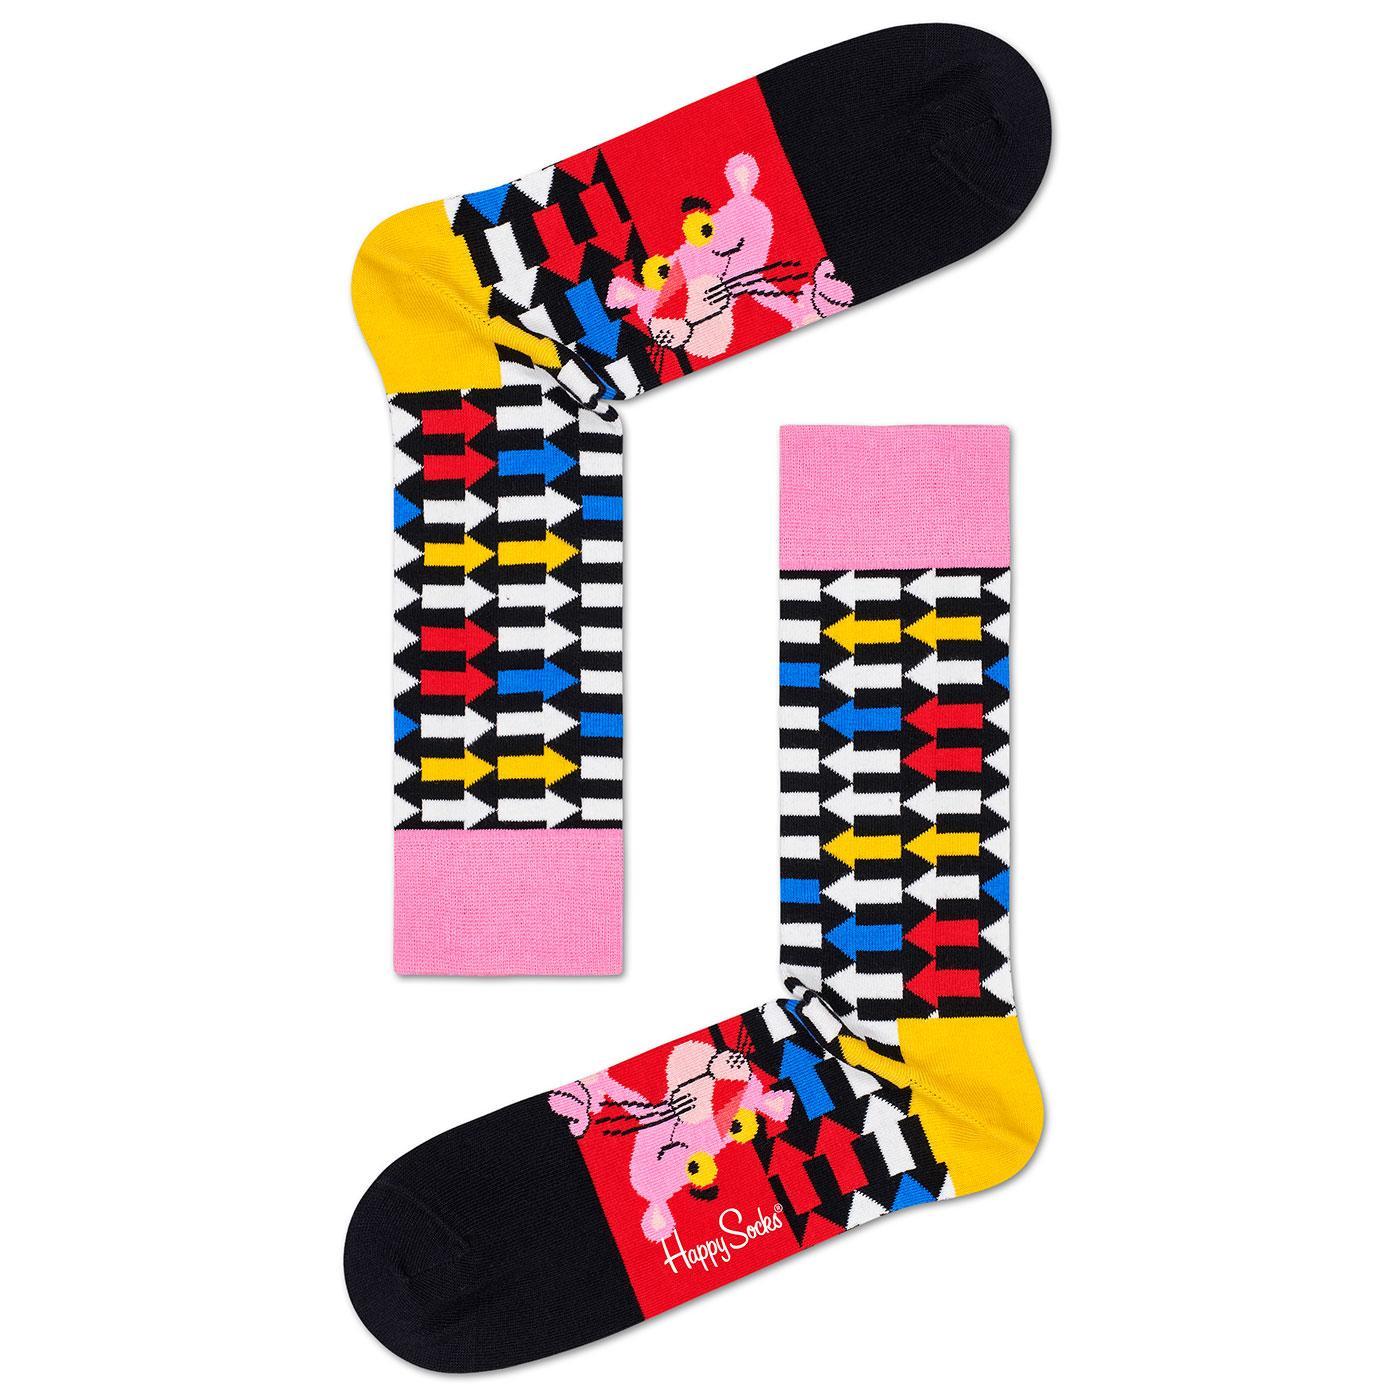 + HAPPY SOCKS x PINK PANTHER Jet Pink Retro Socks